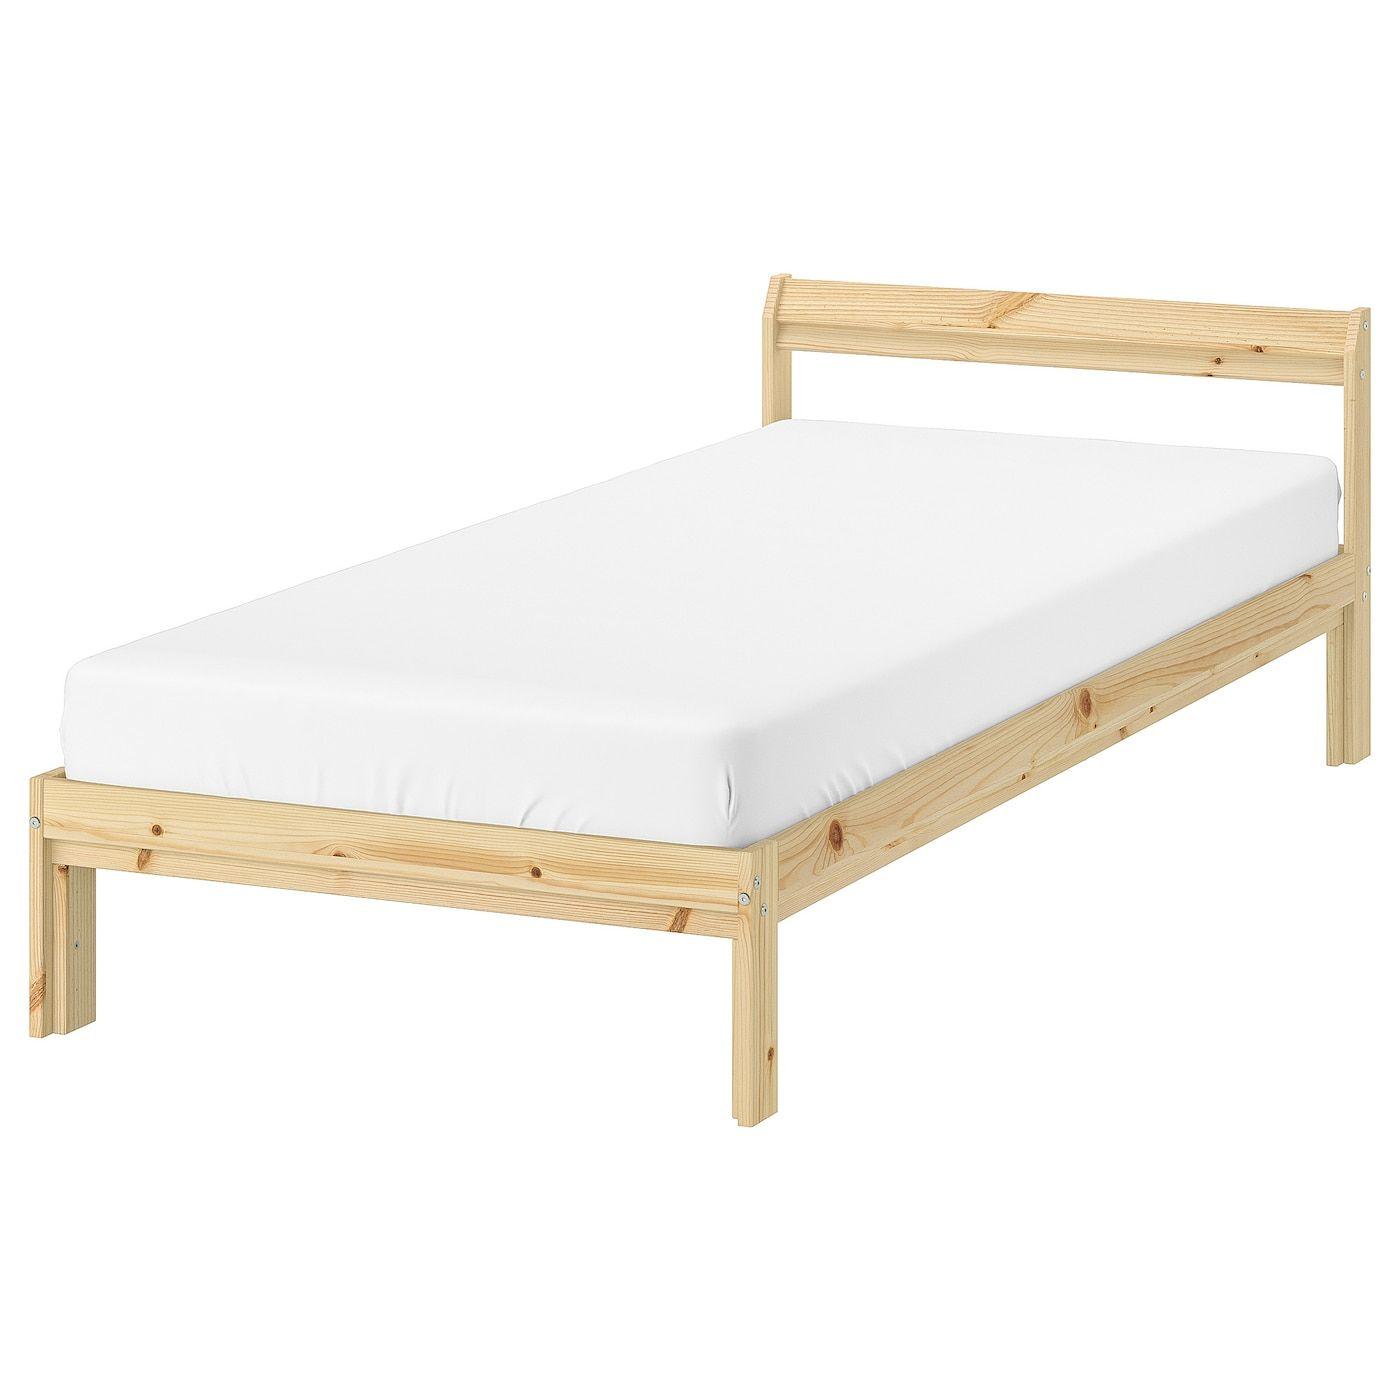 Ikea Neiden Pine Bed Frame In 2020 Bed Frame Ikea Bed